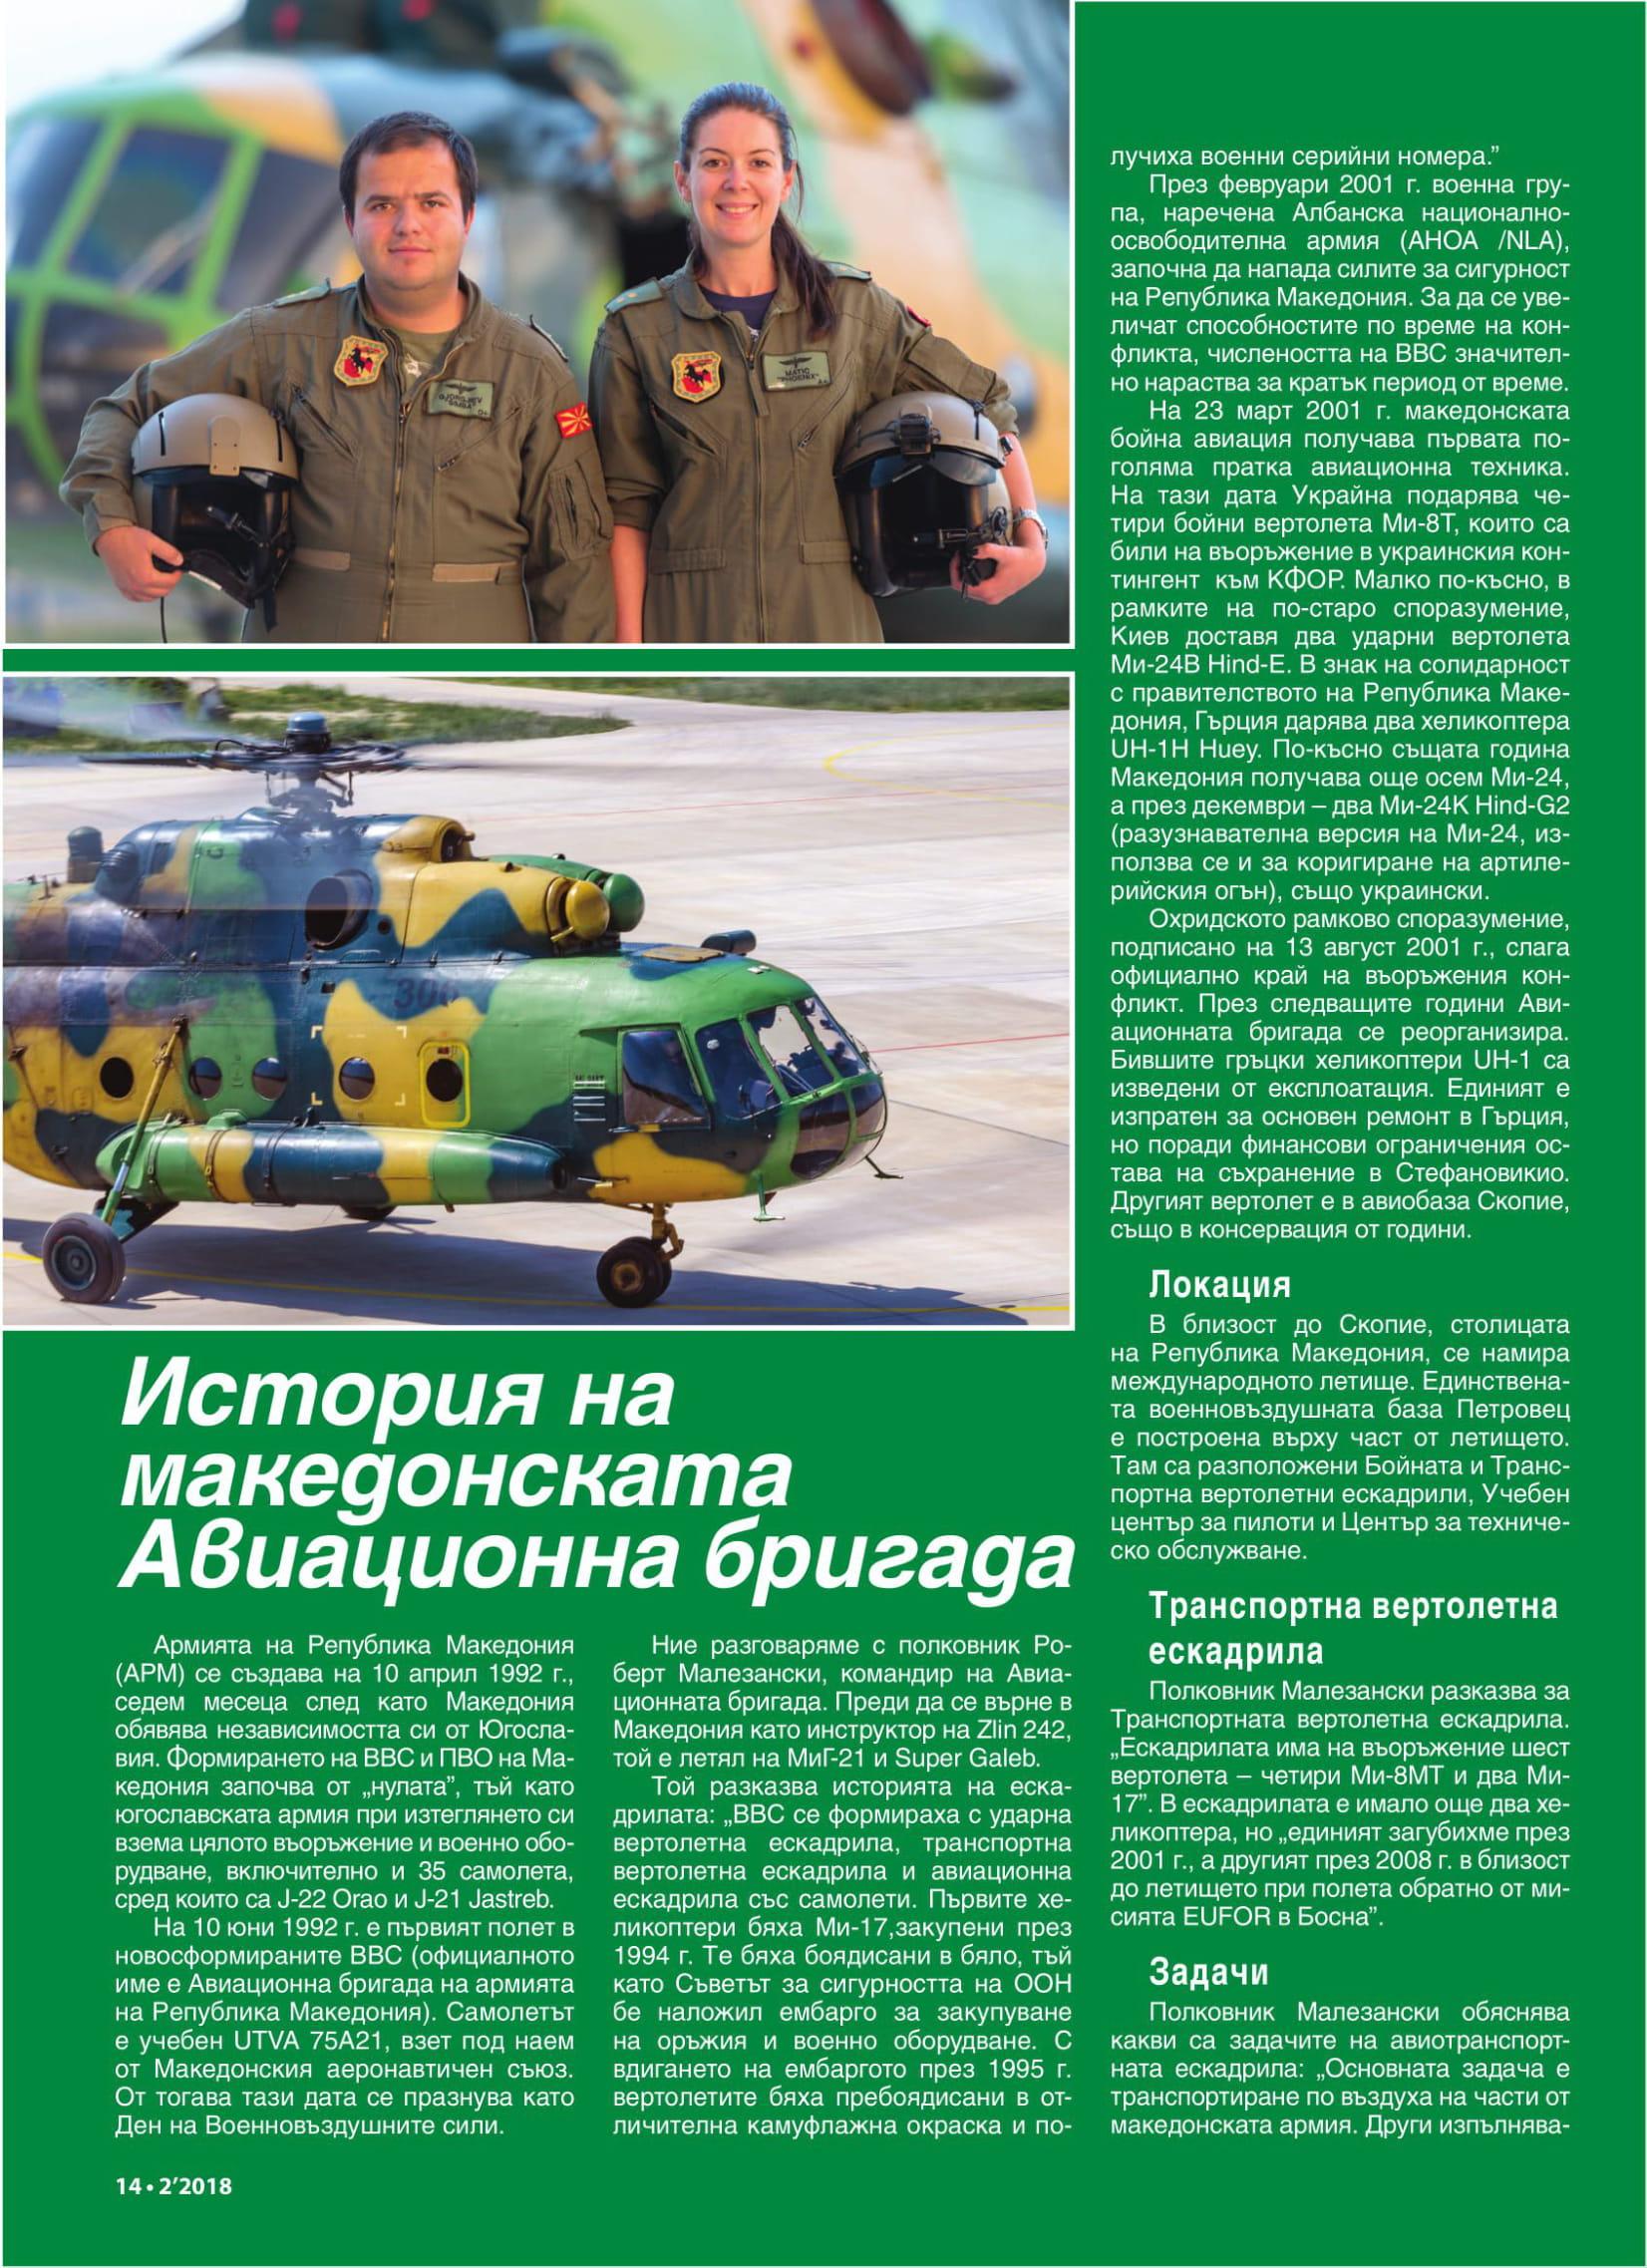 Club Wings (Bulgaria)_Macedonian Air Force (2)-2